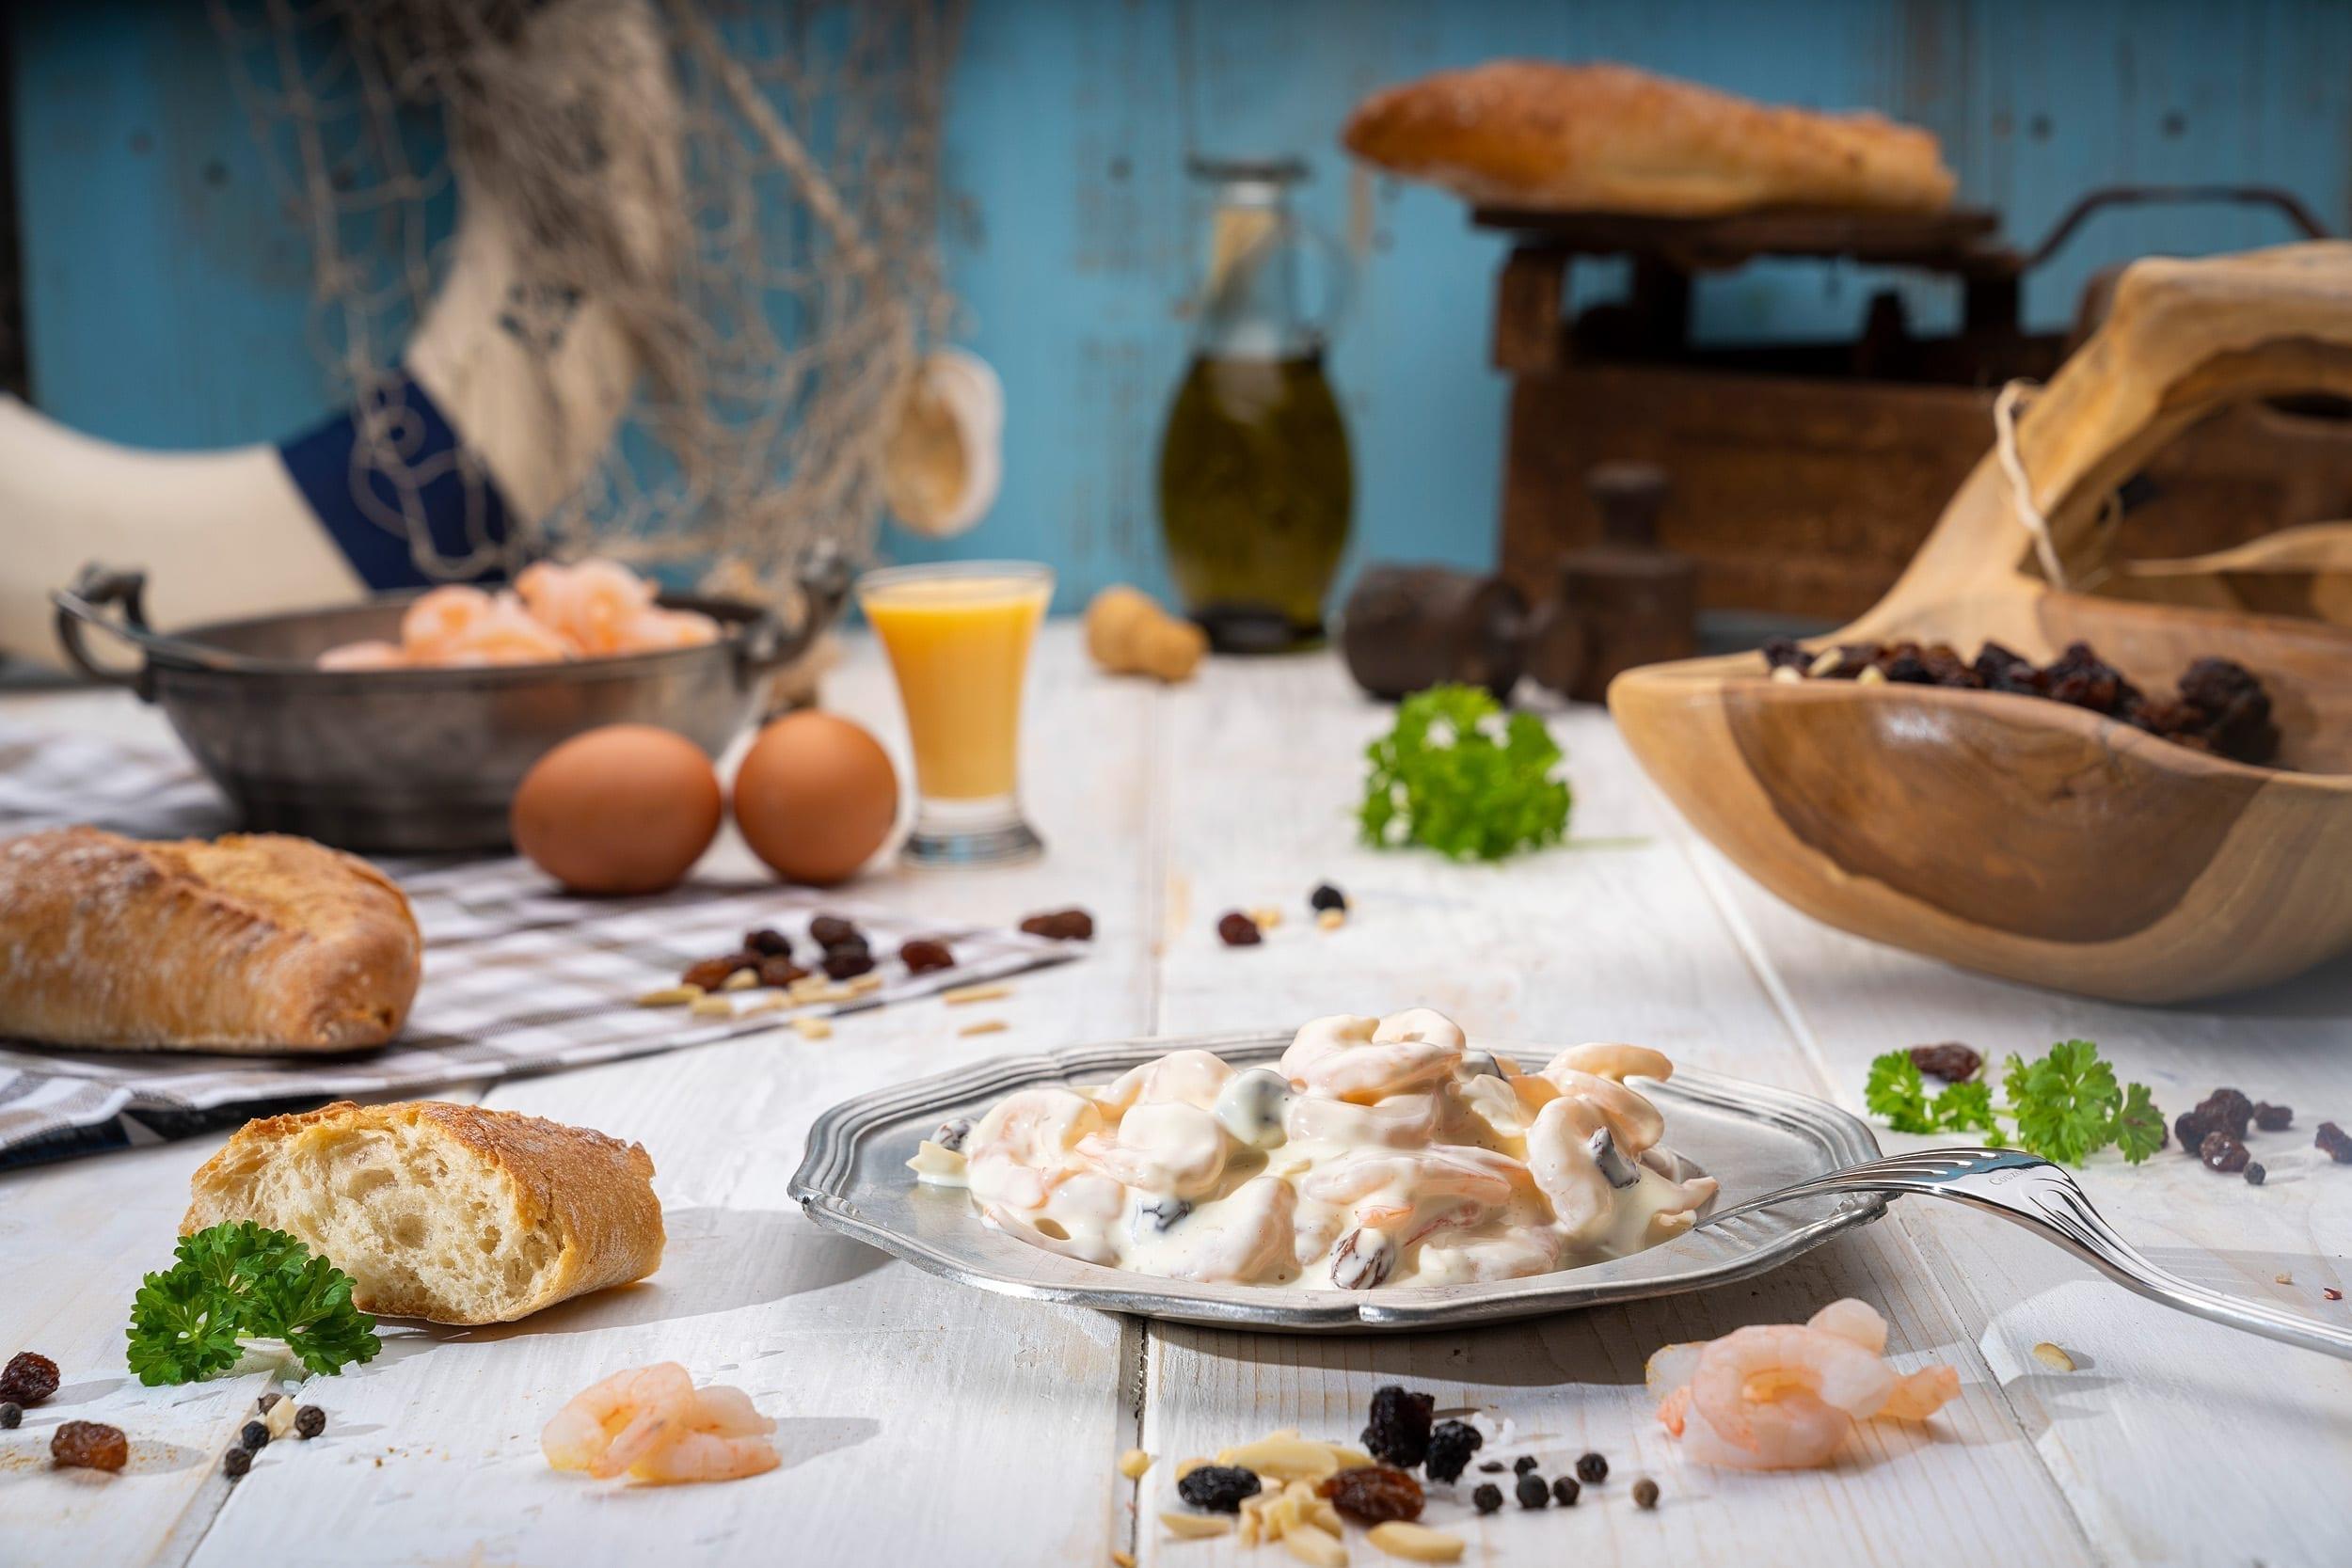 Produktfotograf Foodfotograf Fisch Marcel Mende Salate garnelen Foodfotografie Fischfotograf Produktfotografie